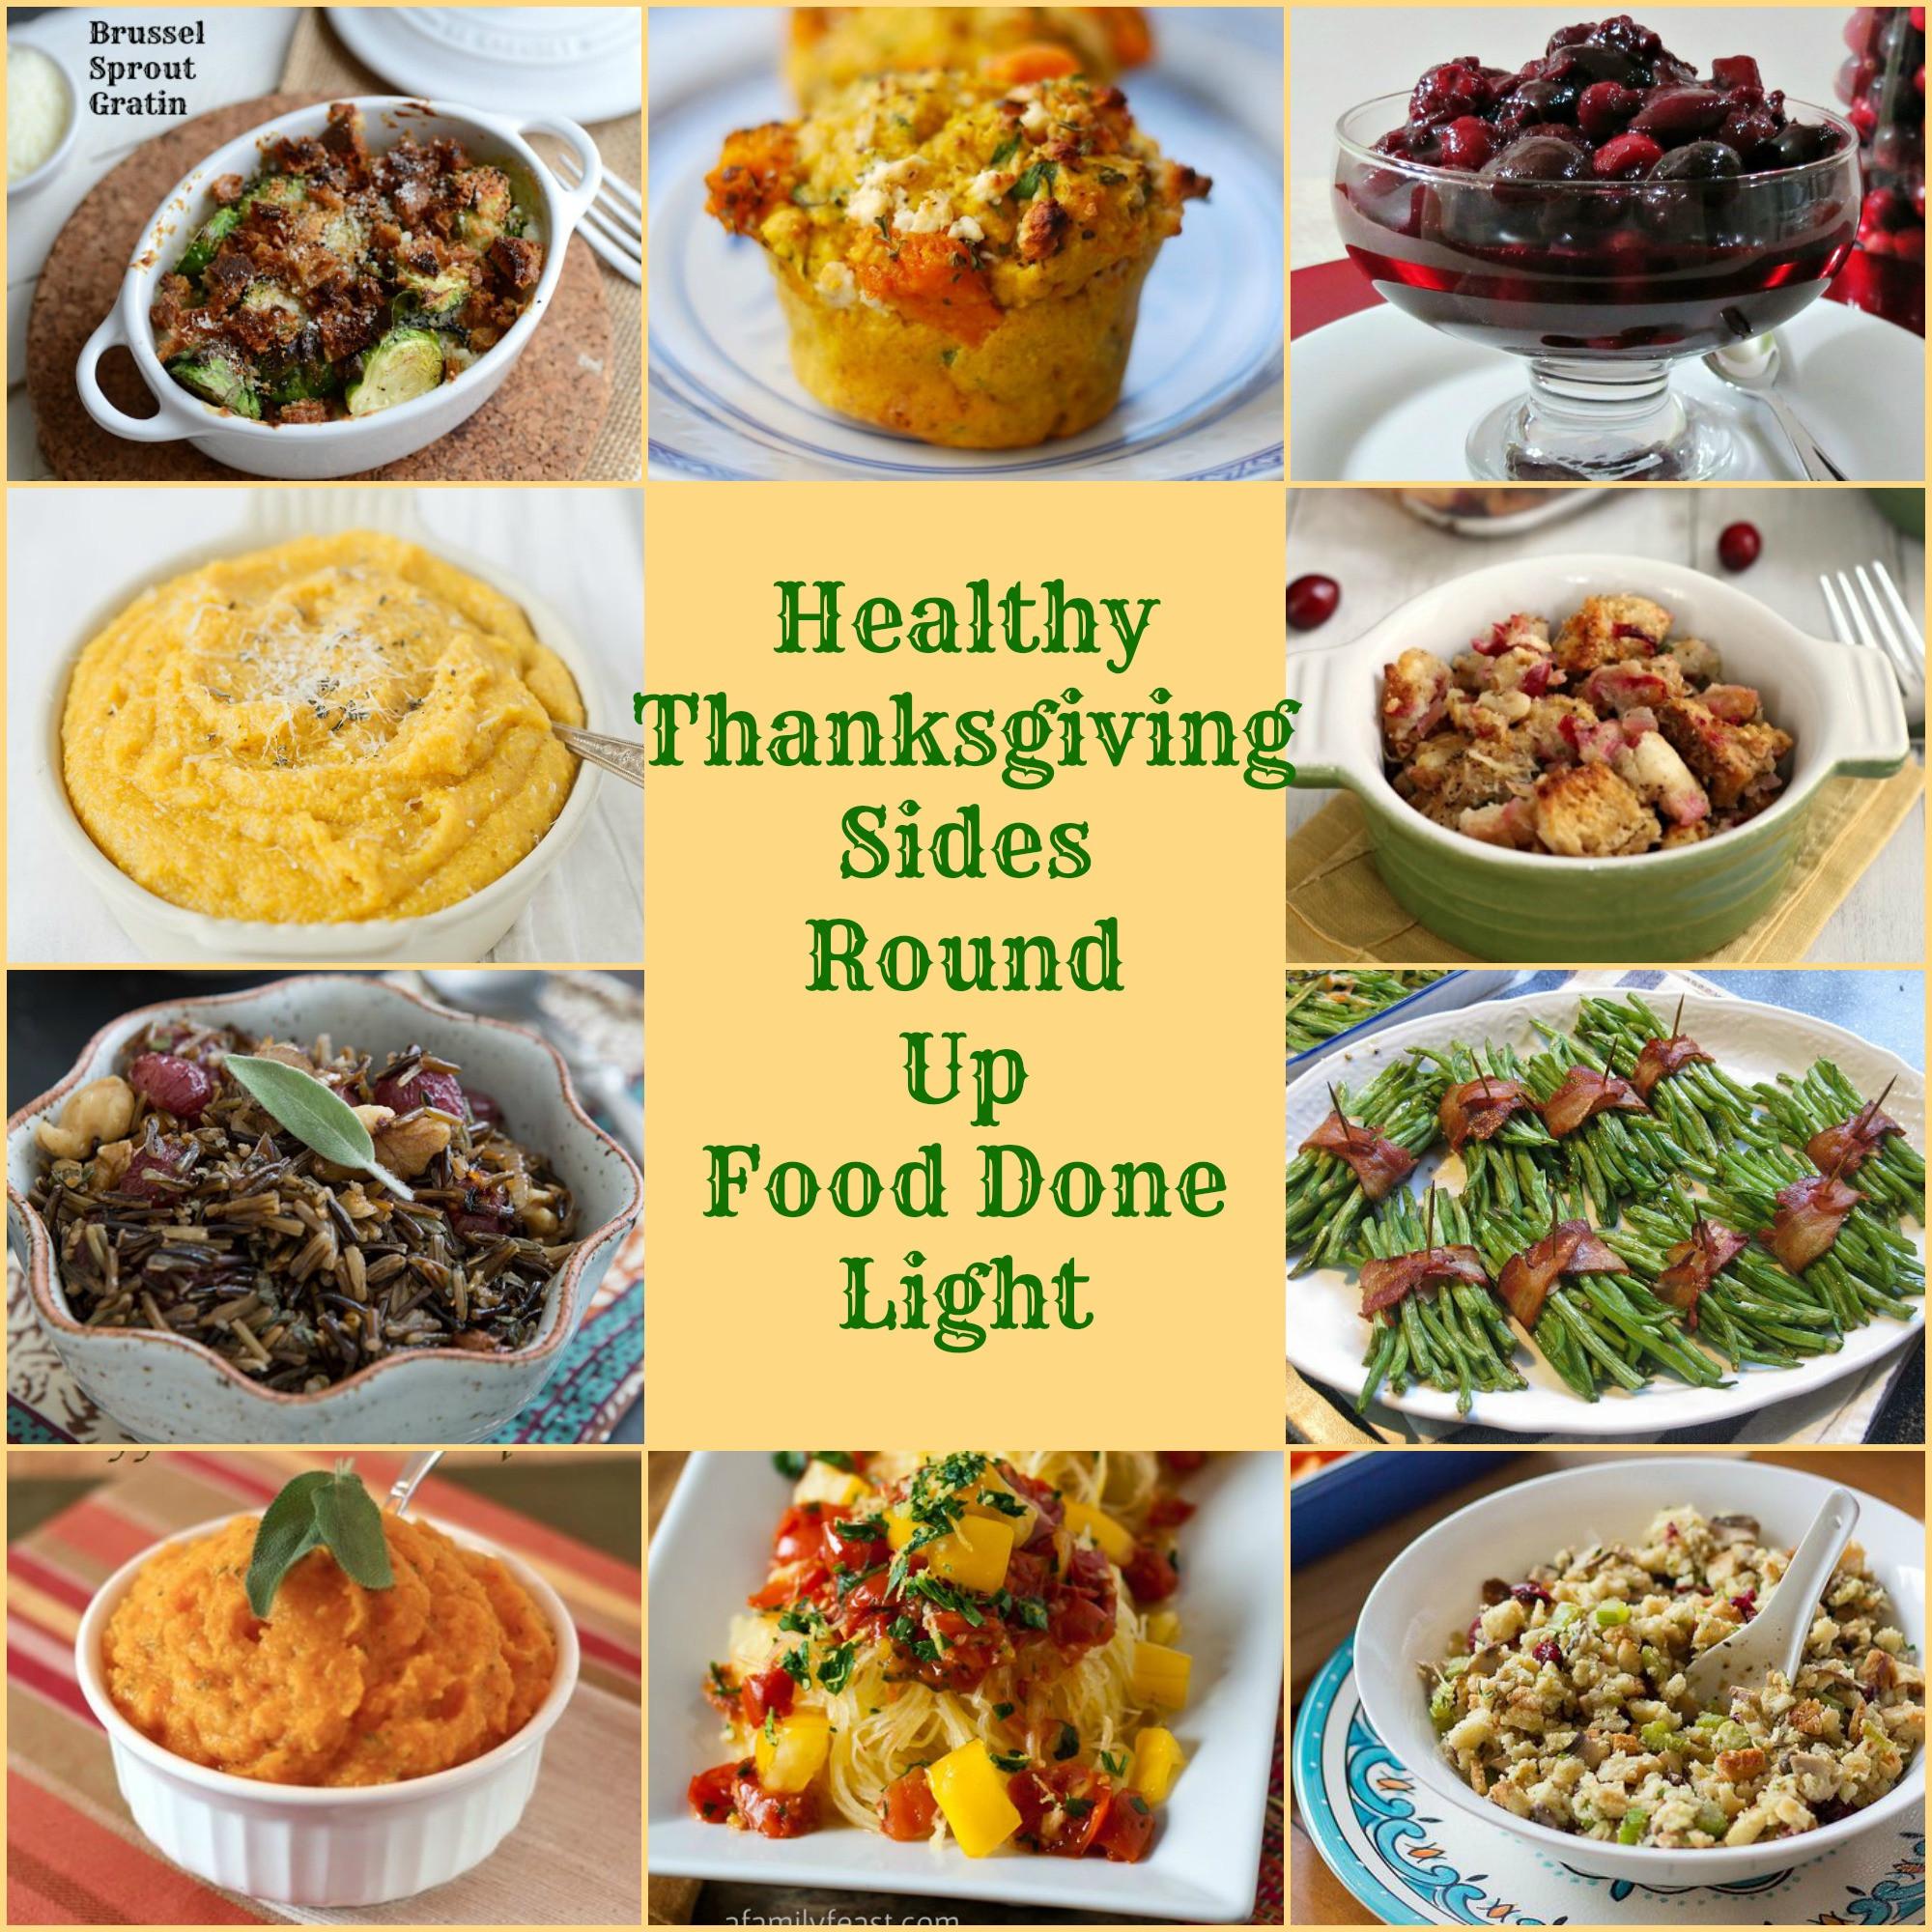 Healthy Thanksgiving Food  Healthy Thanksgiving Sides Recipe Round Up Food Done Light